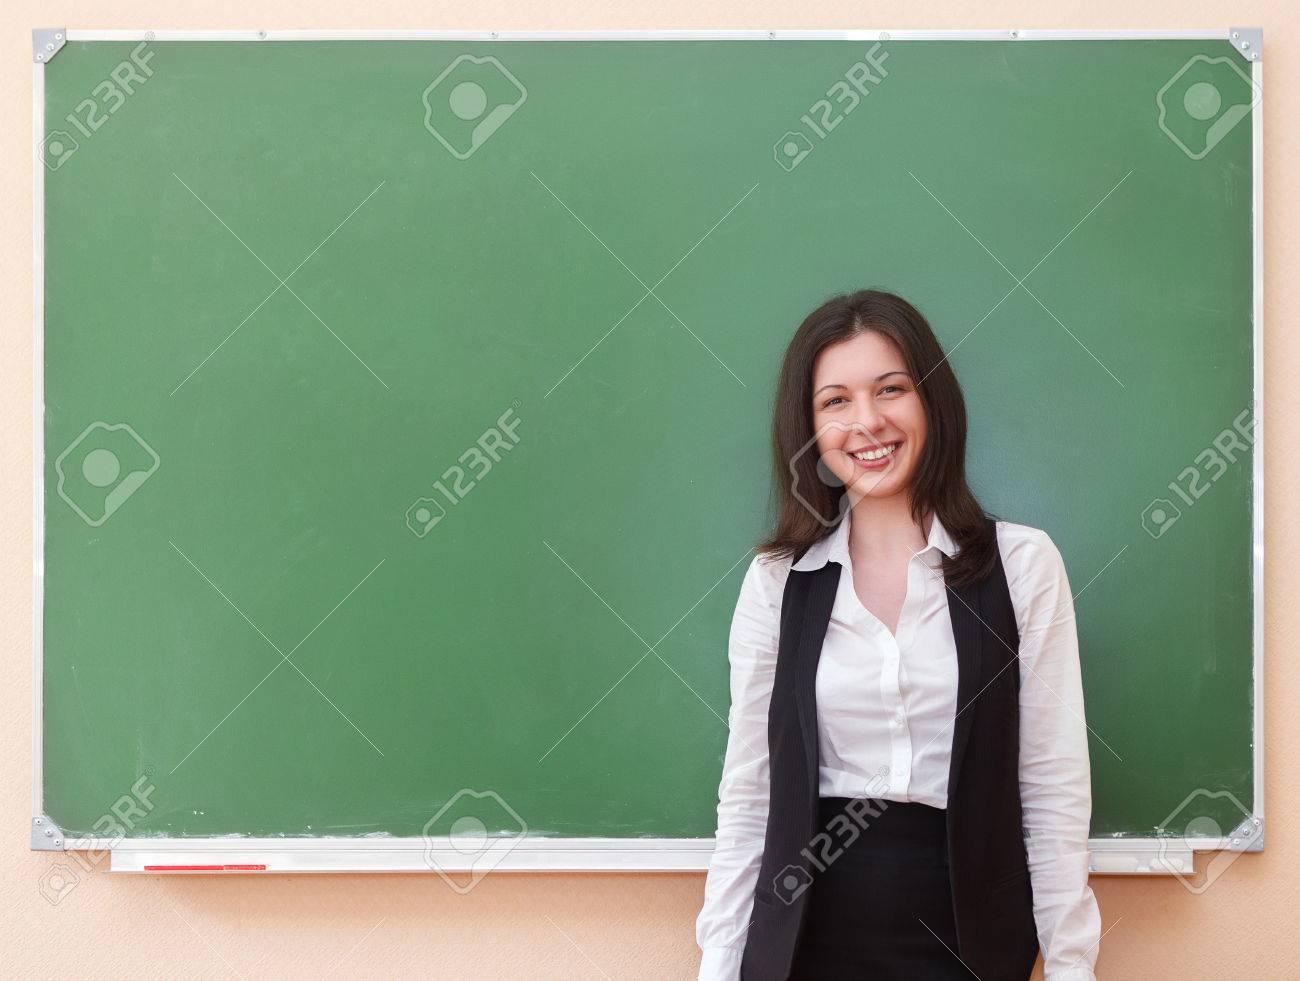 Student girl standing near clean blackboard in the classroom - 38253515